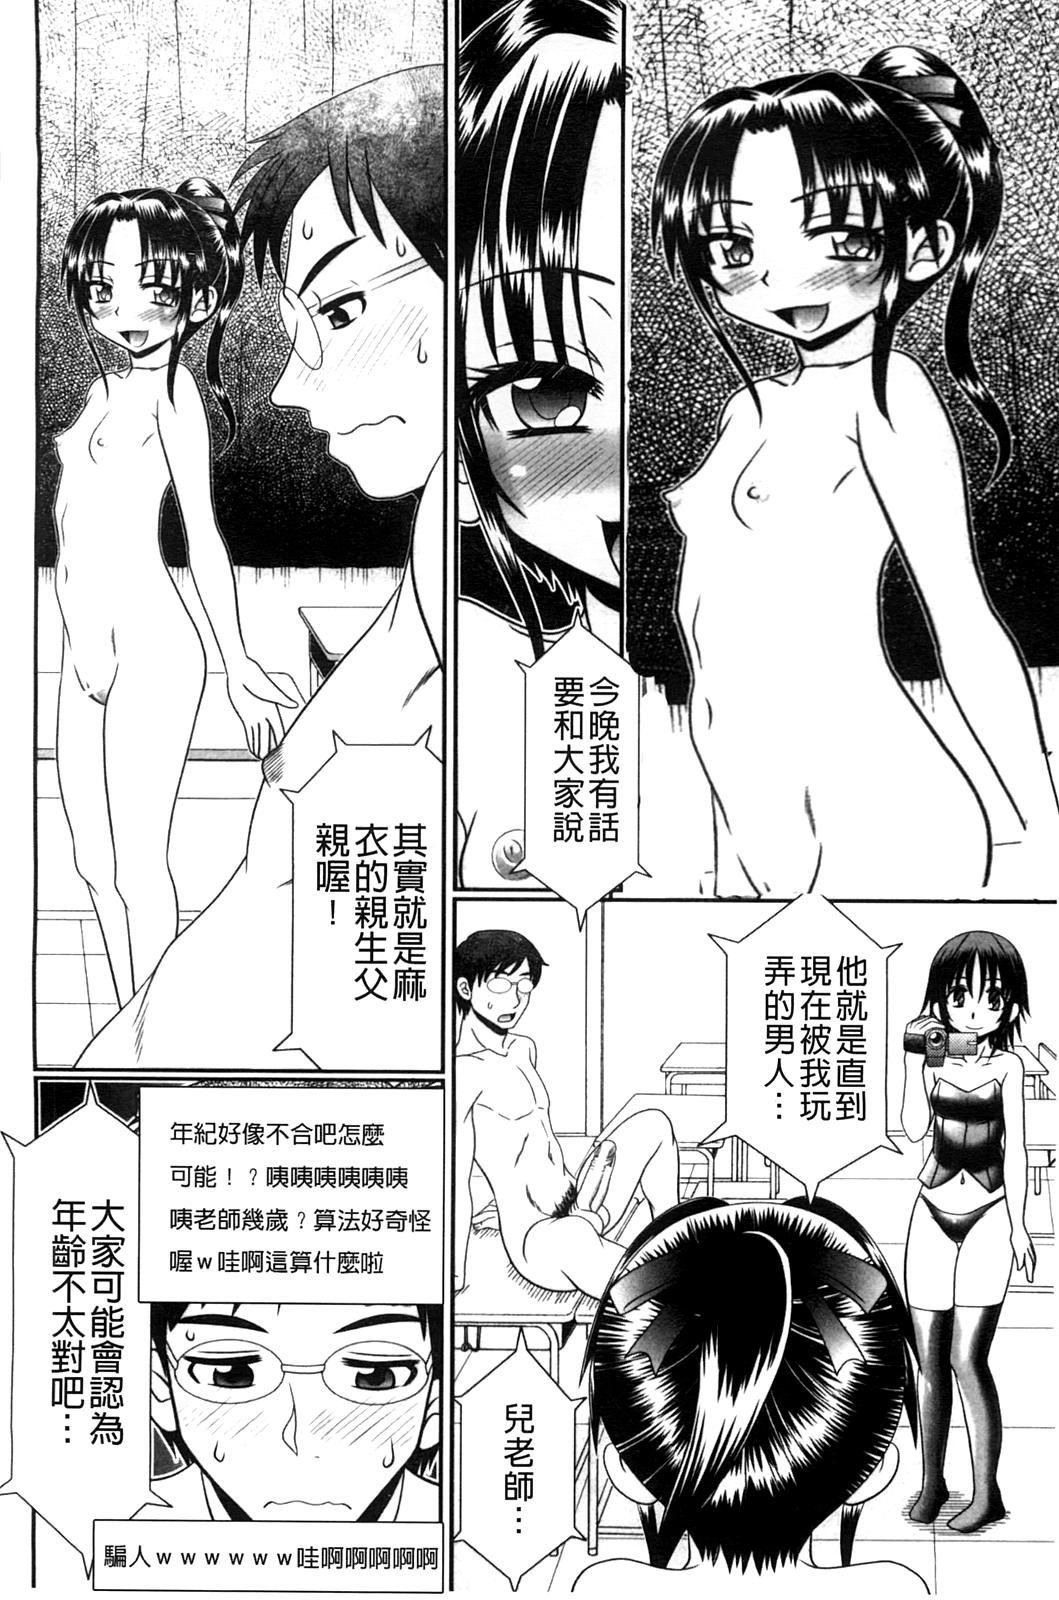 Higyaku Kyoushitsu 192